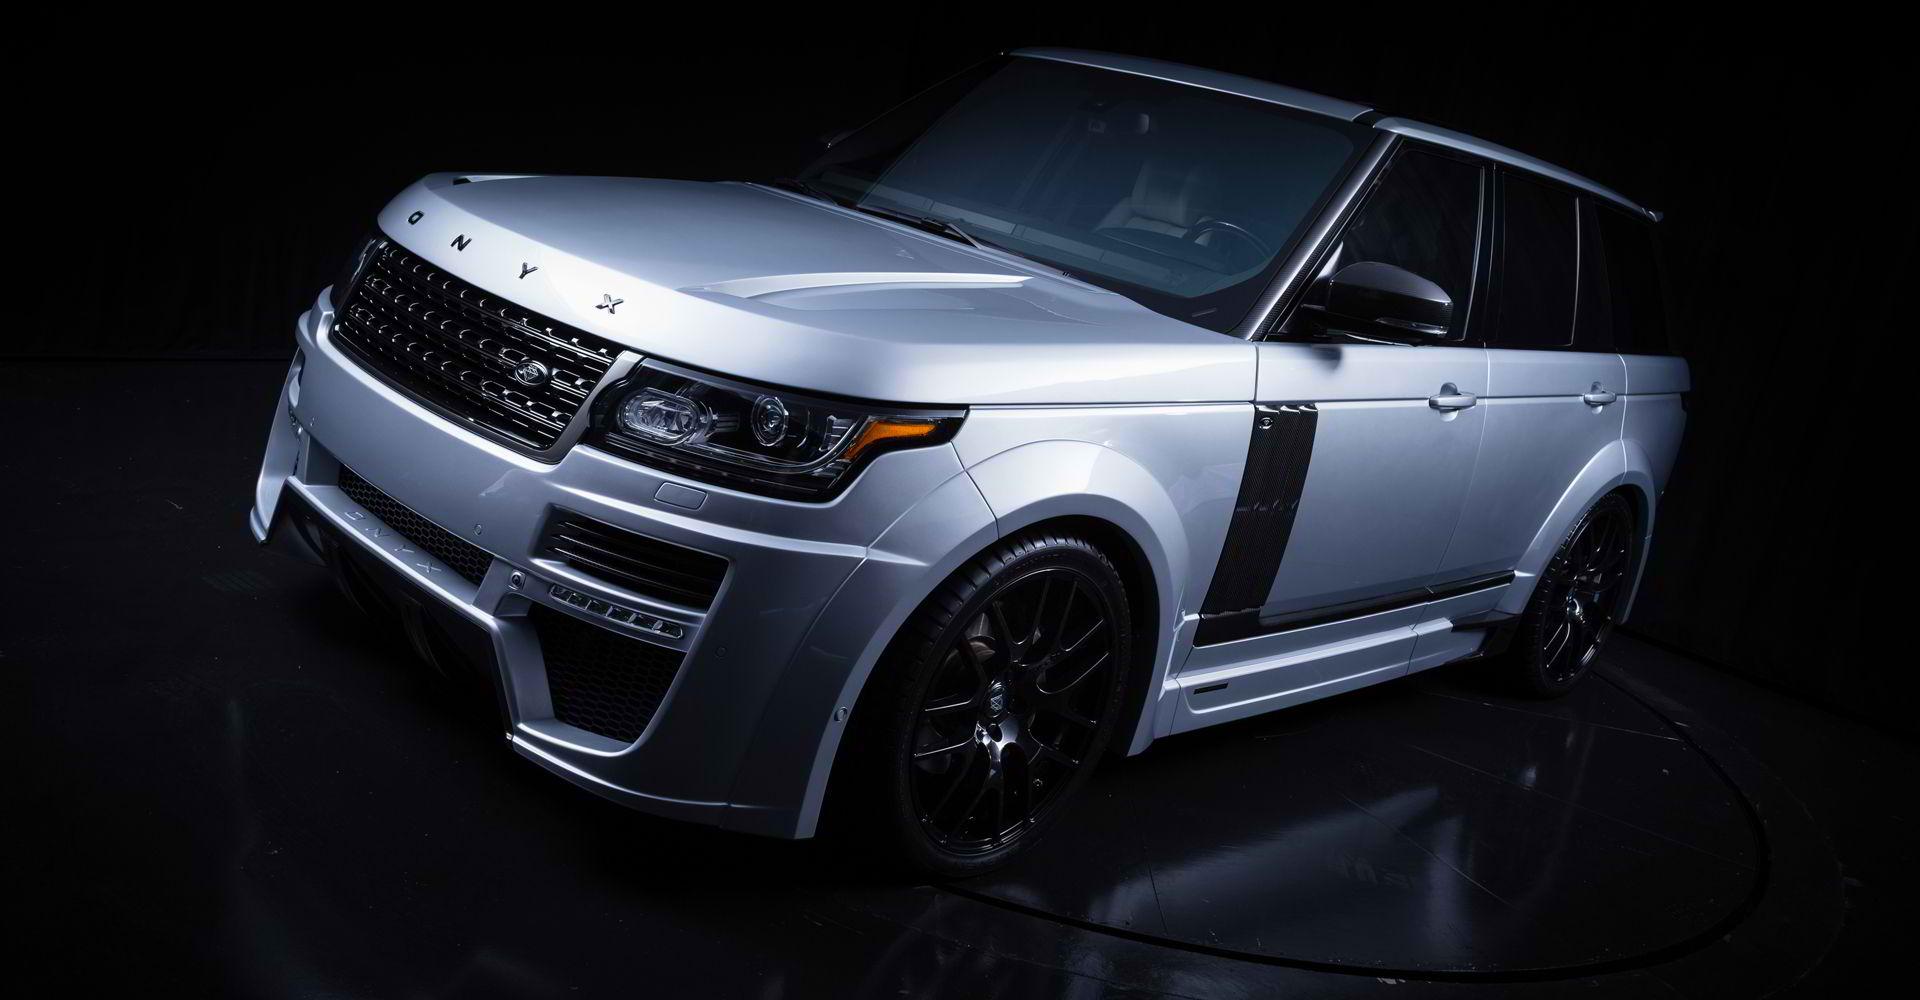 2014 onyx range rover vogue aspen edition body kit. Black Bedroom Furniture Sets. Home Design Ideas